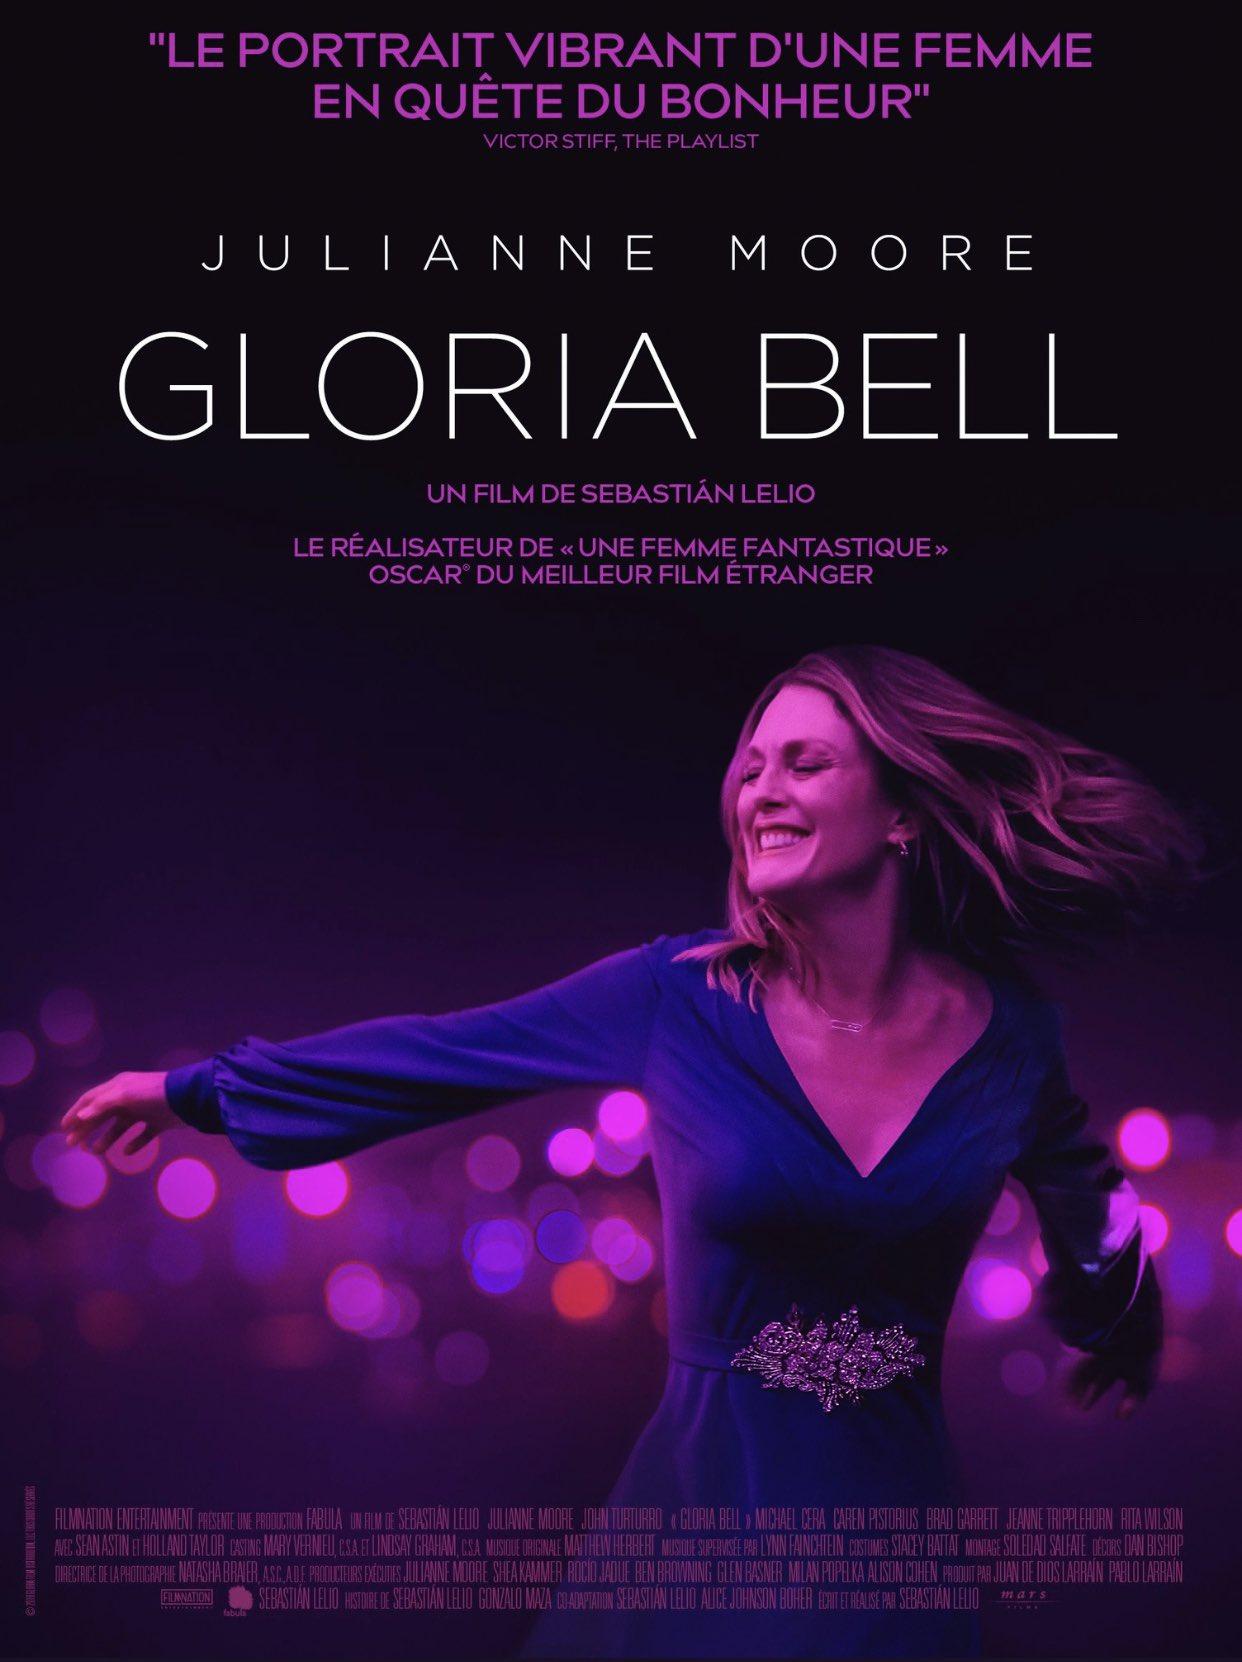 Gloria Bell sebastian Lelio affiche film critique avis